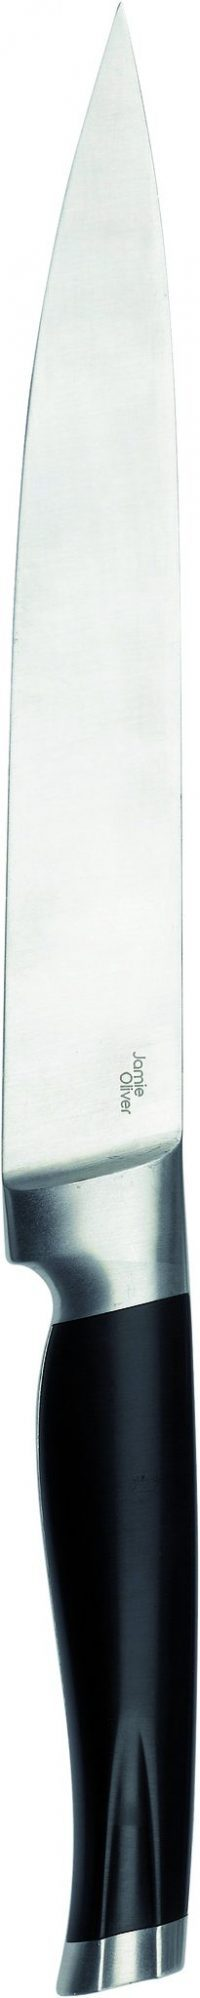 JAMIE OLIVER Карвинг нож - 20 см